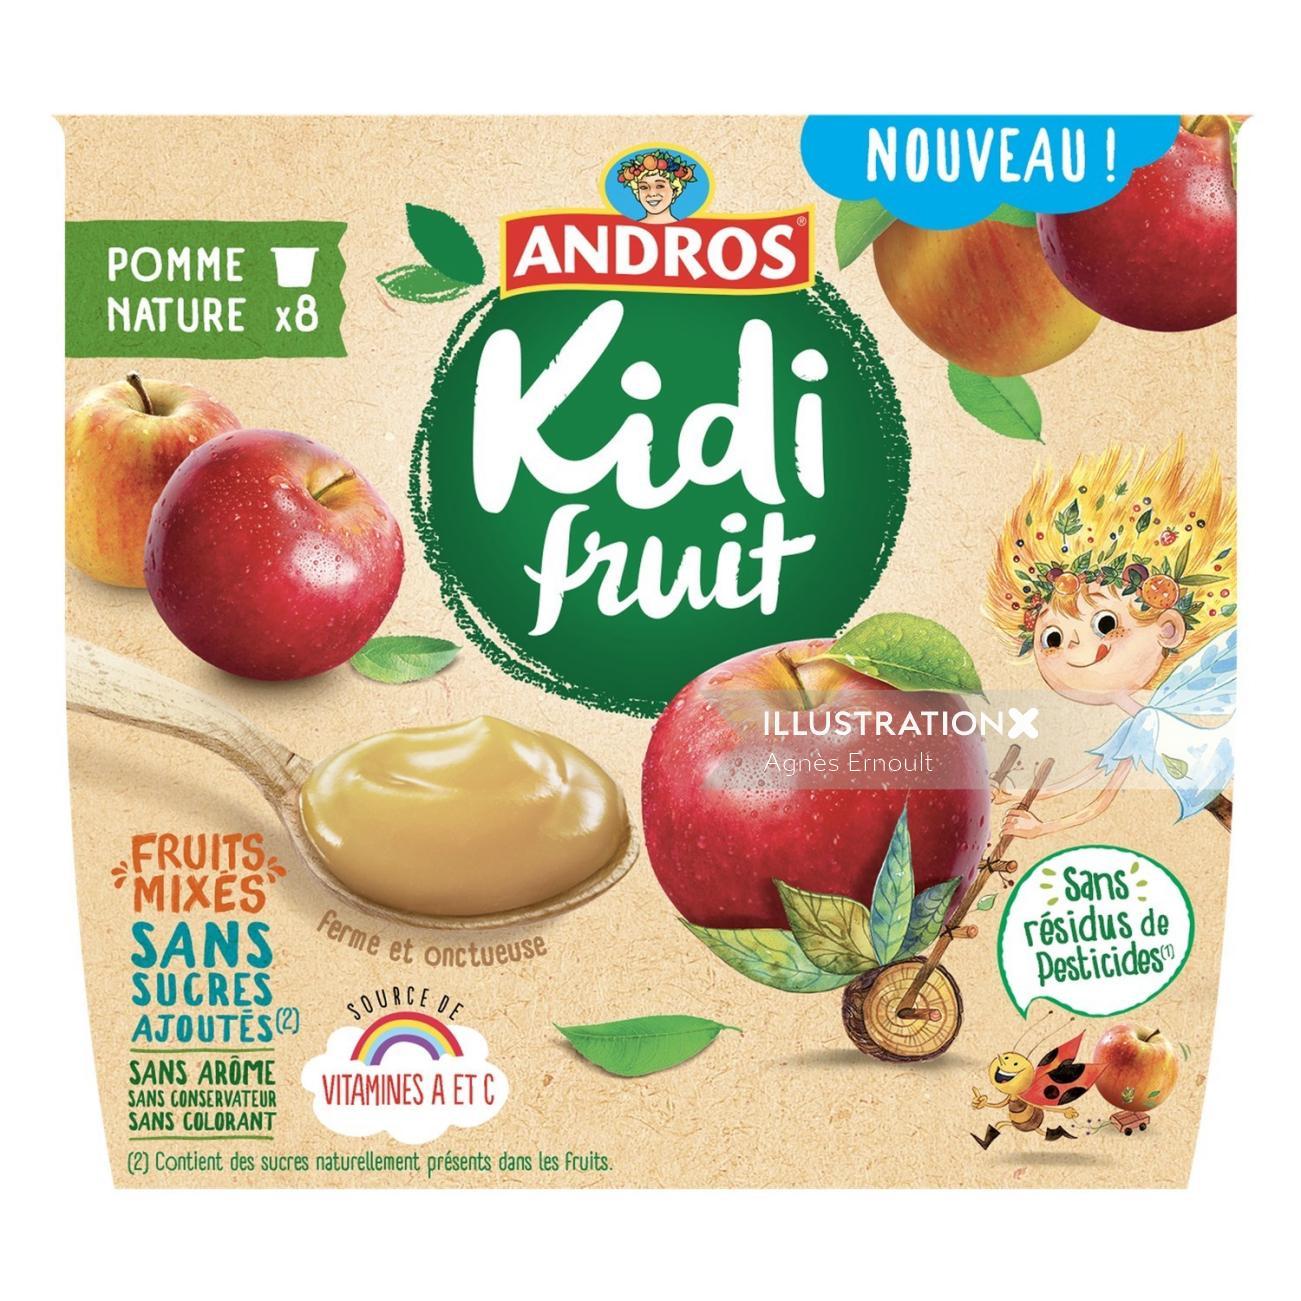 Poster design of Andros kidi fruit